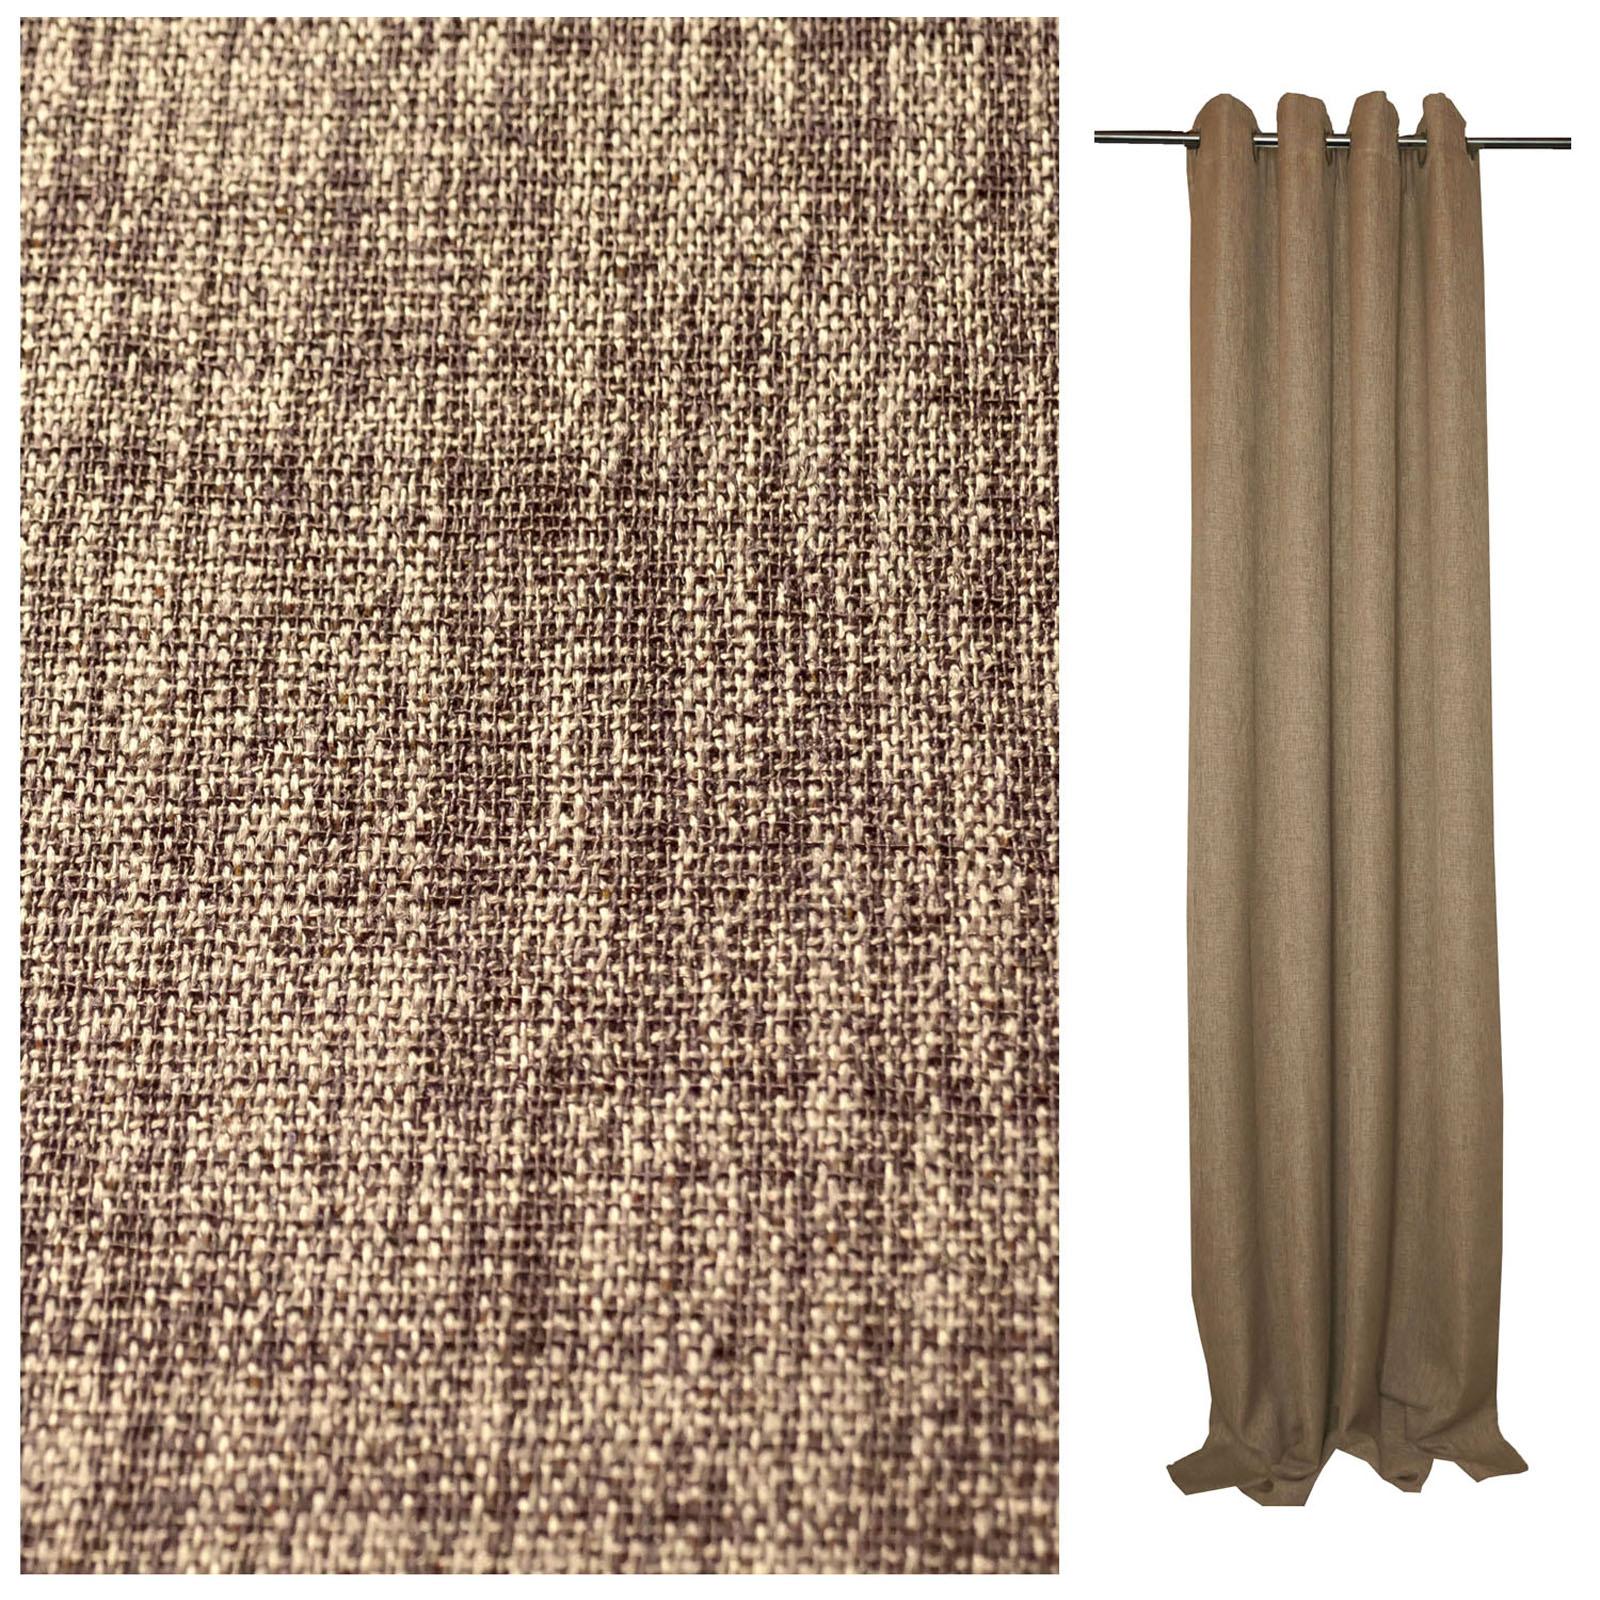 vorhang naturleinen look meliert sen 140x245 cm blickdicht gardine bergardine ebay. Black Bedroom Furniture Sets. Home Design Ideas